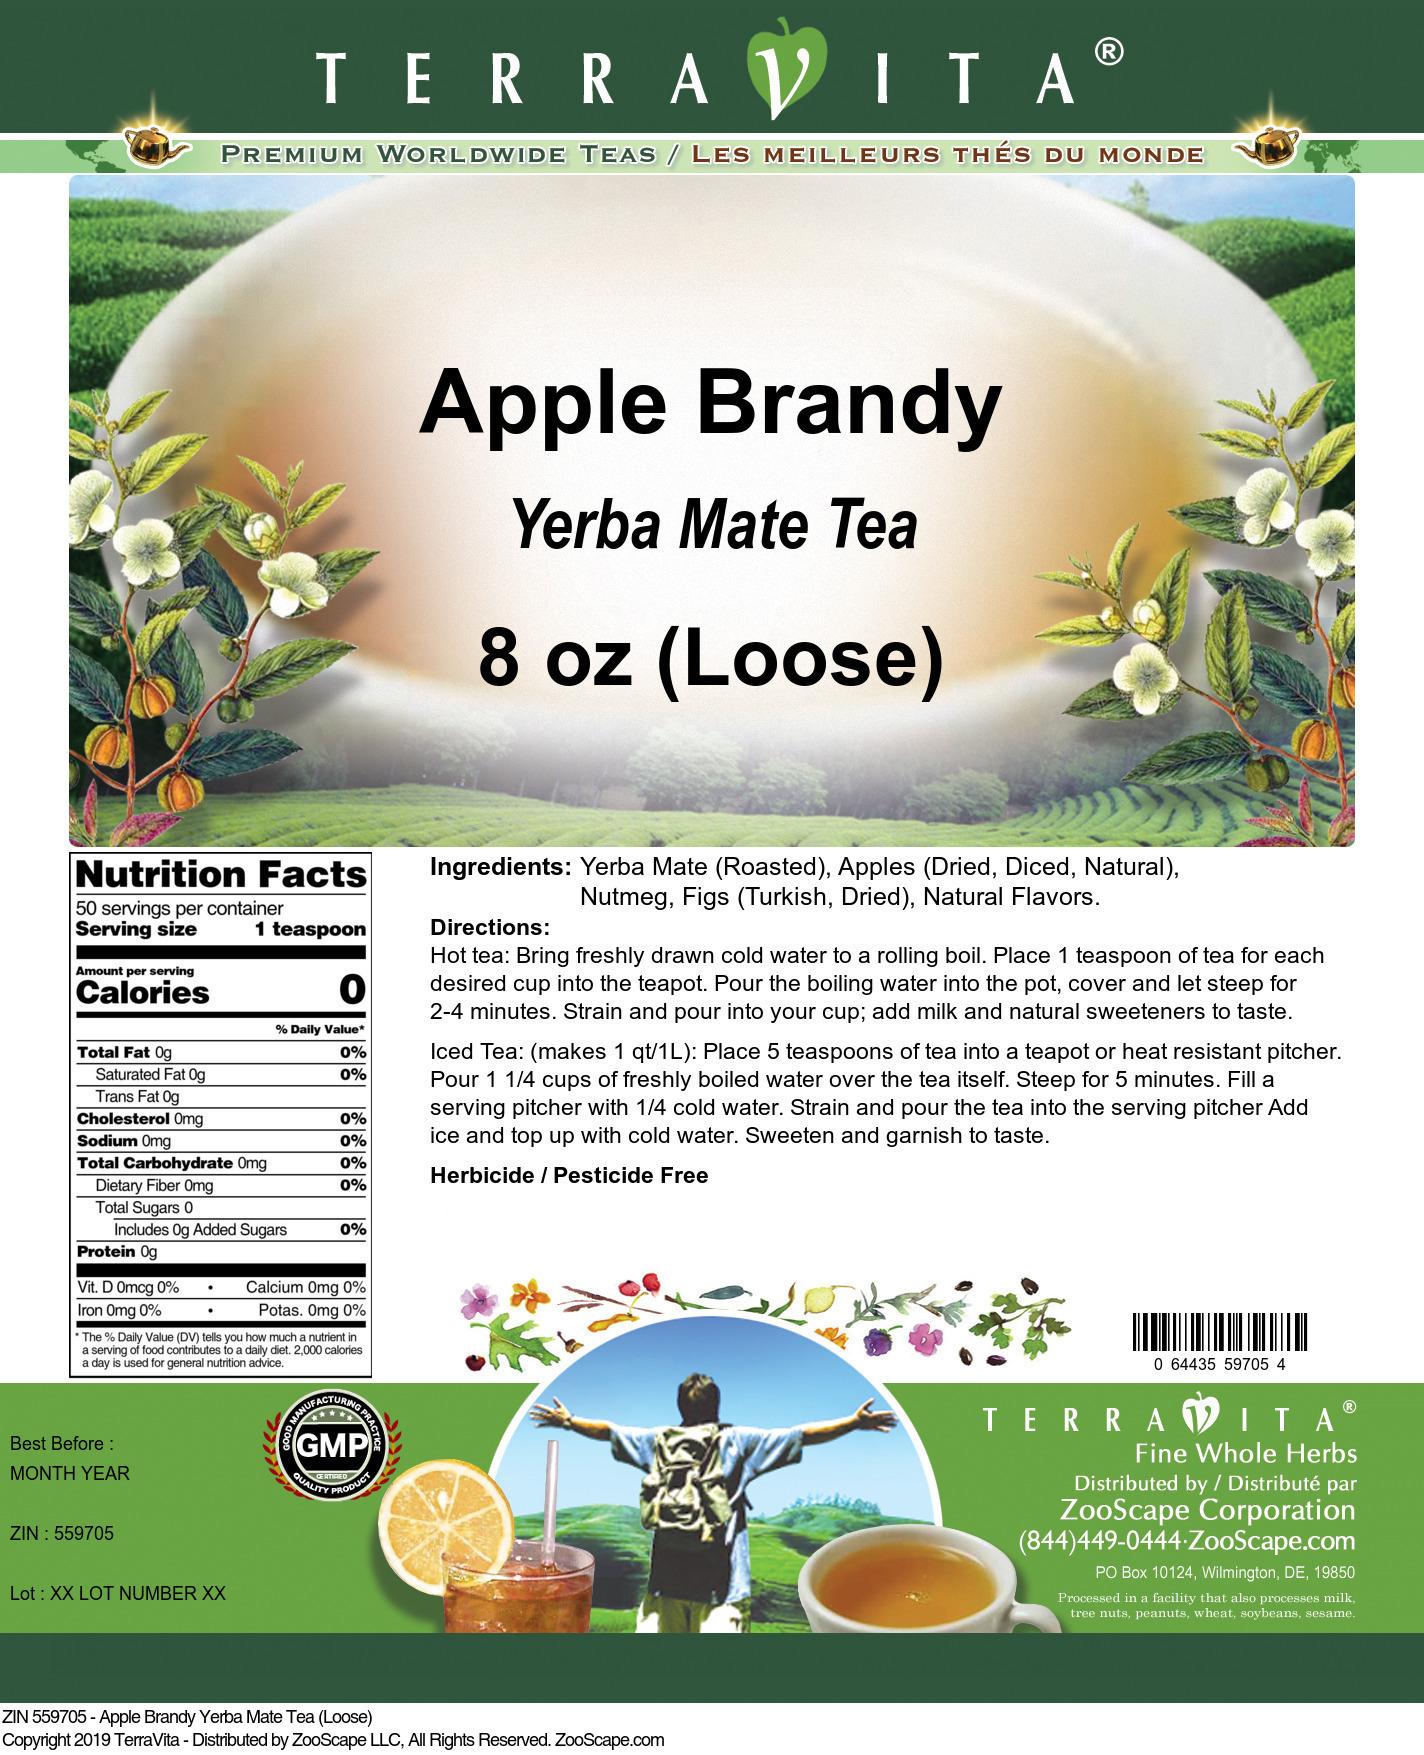 Apple Brandy Yerba Mate